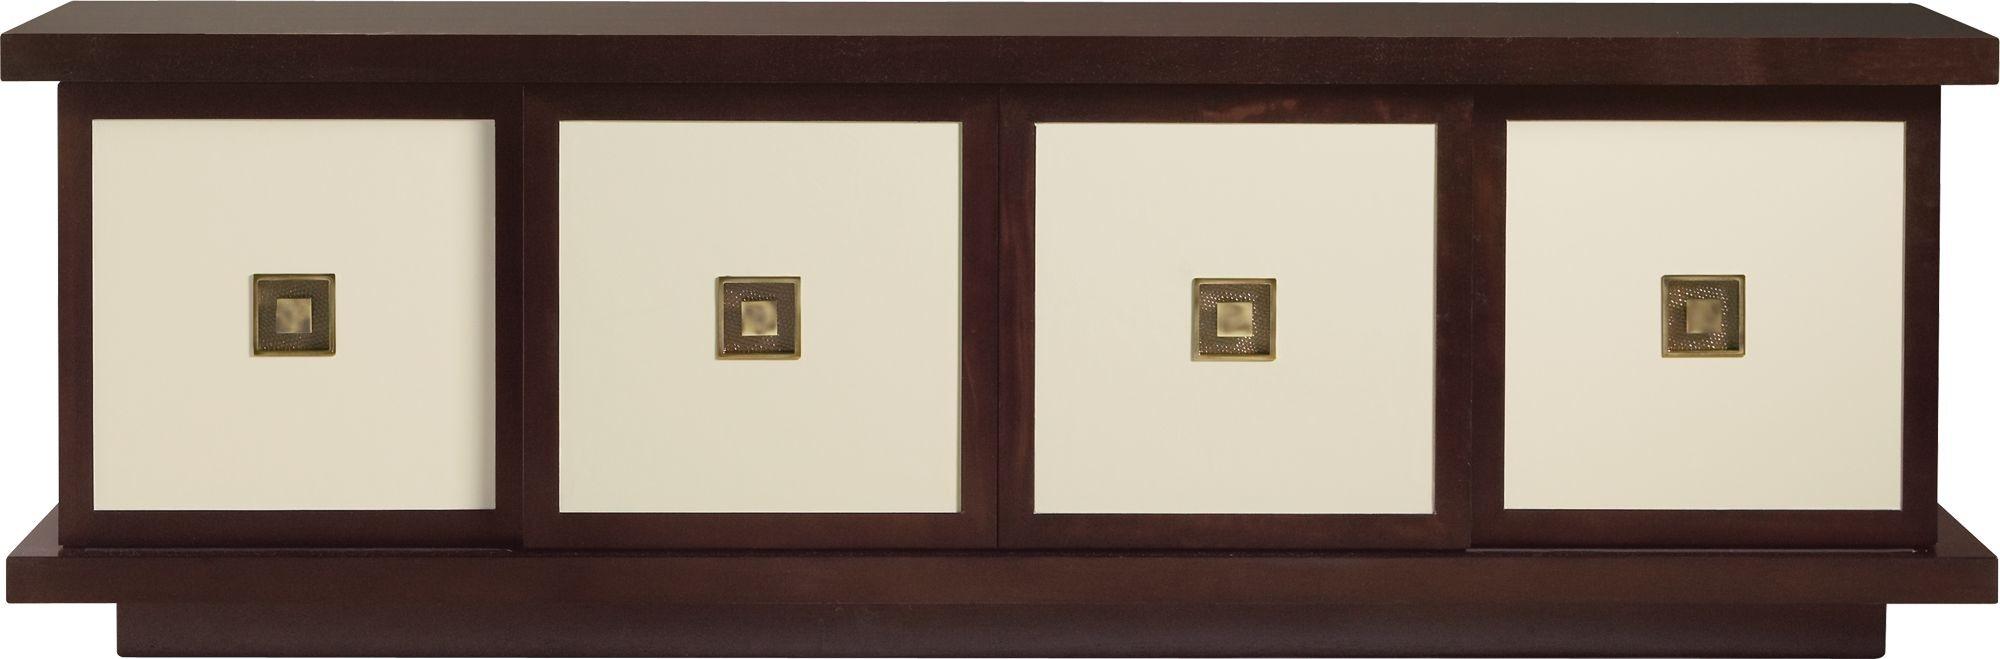 Baker Furniture 7865 Living Room Thomas Pheasant Metropolitan Cabinet